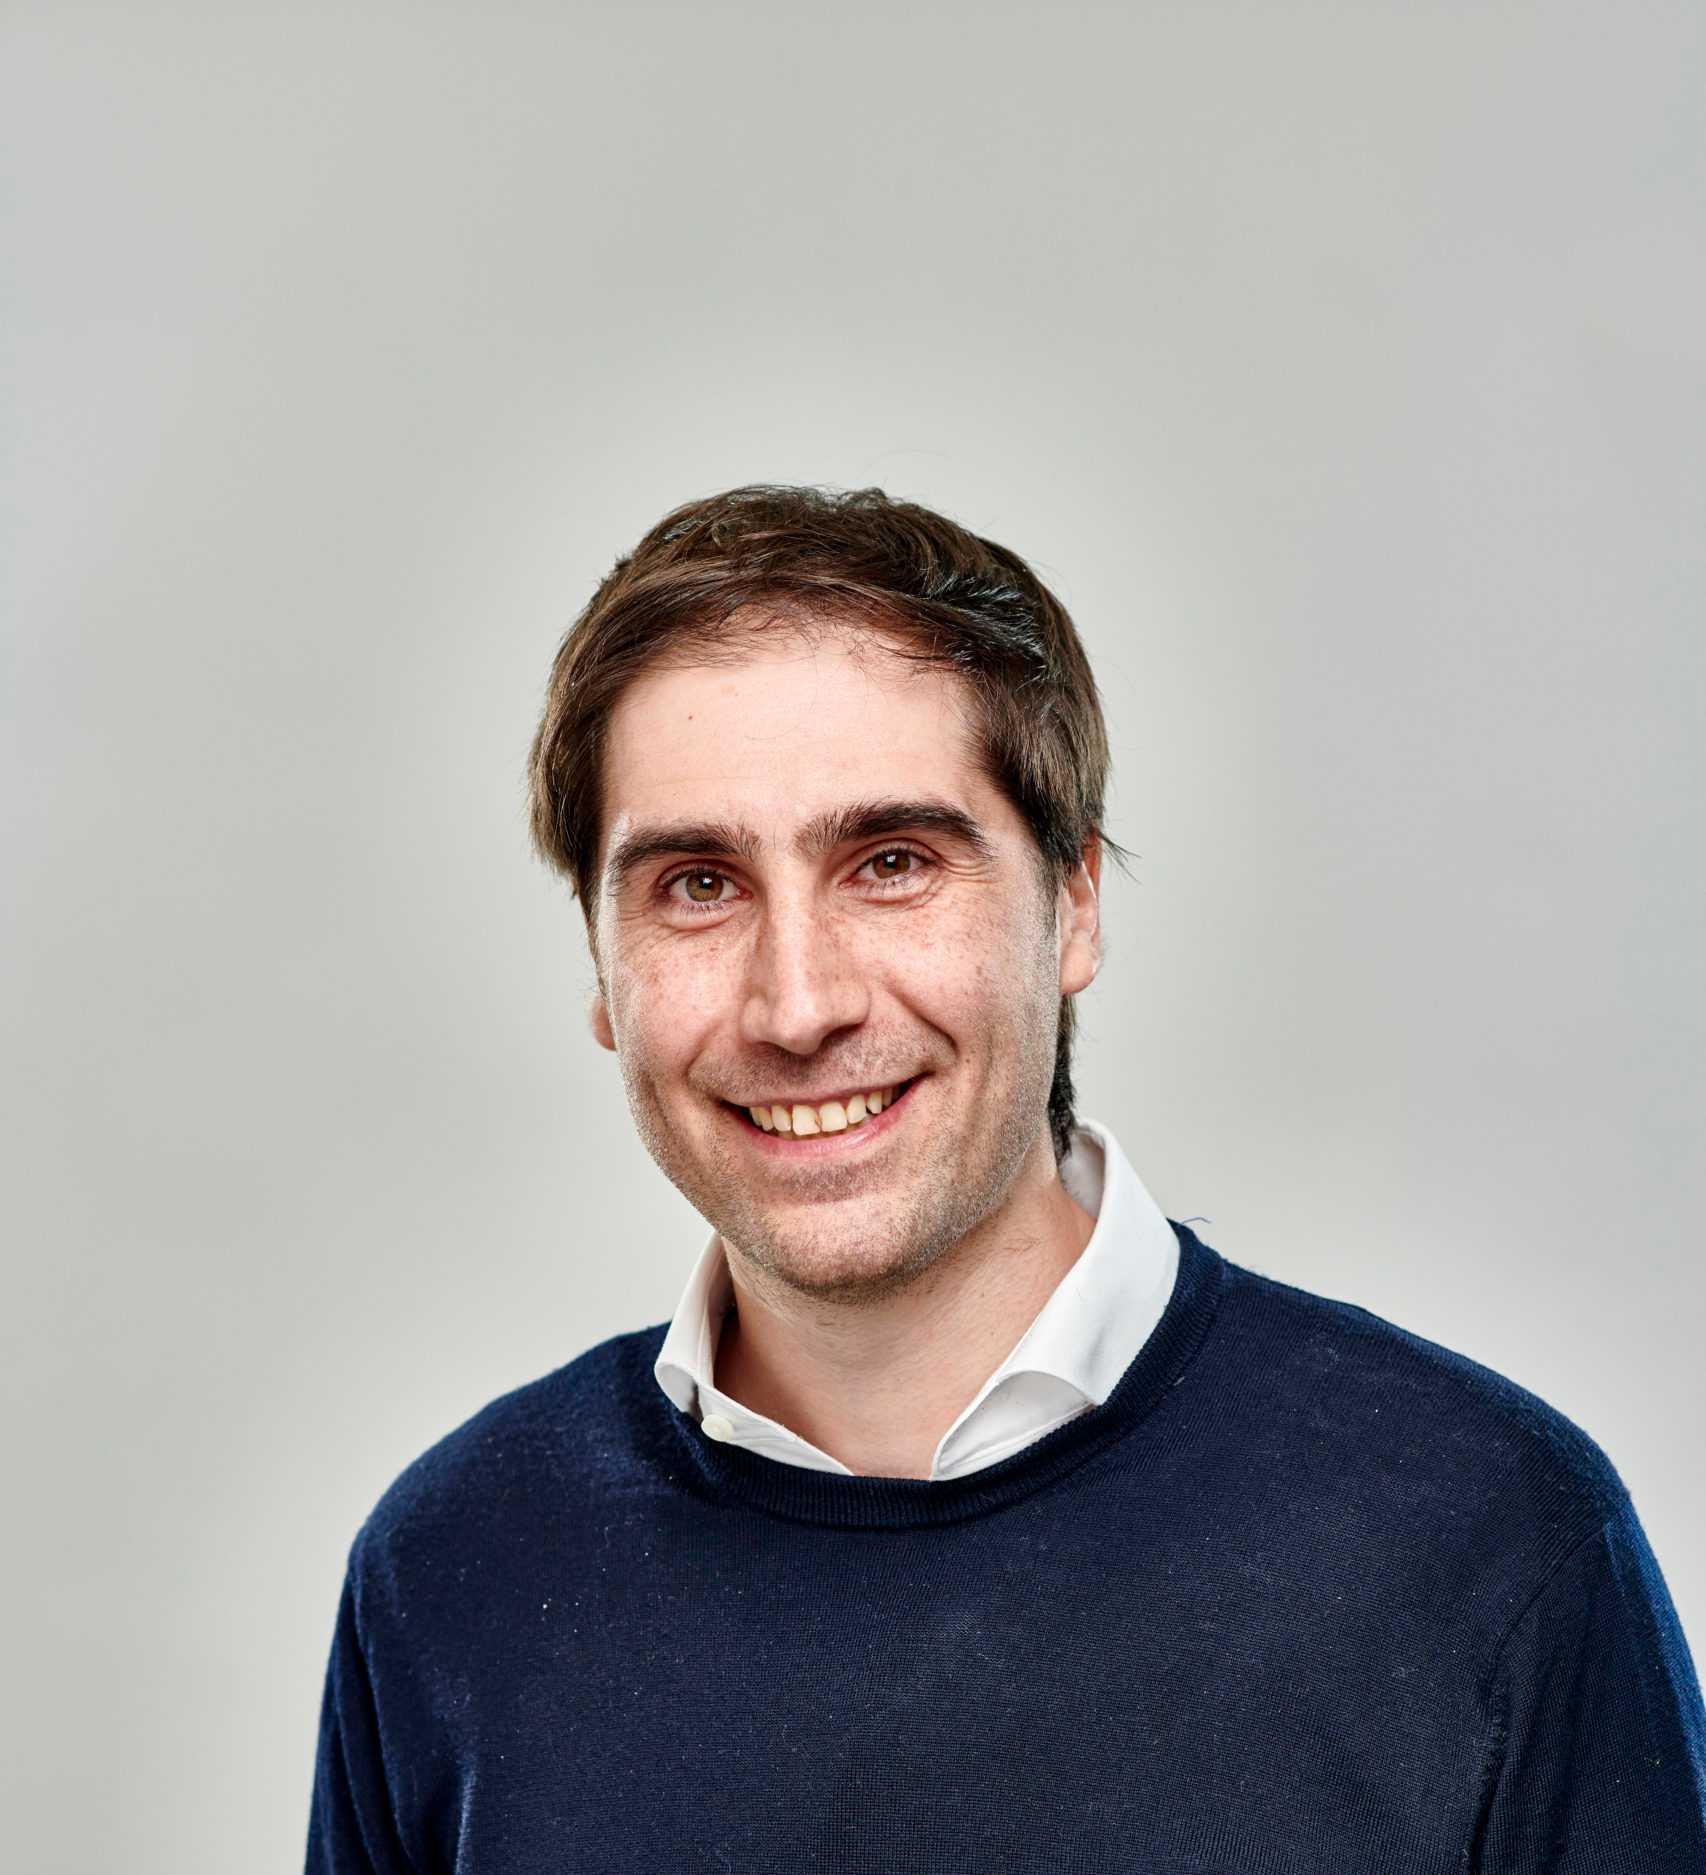 Richard Fattal, CCO of Zencargo